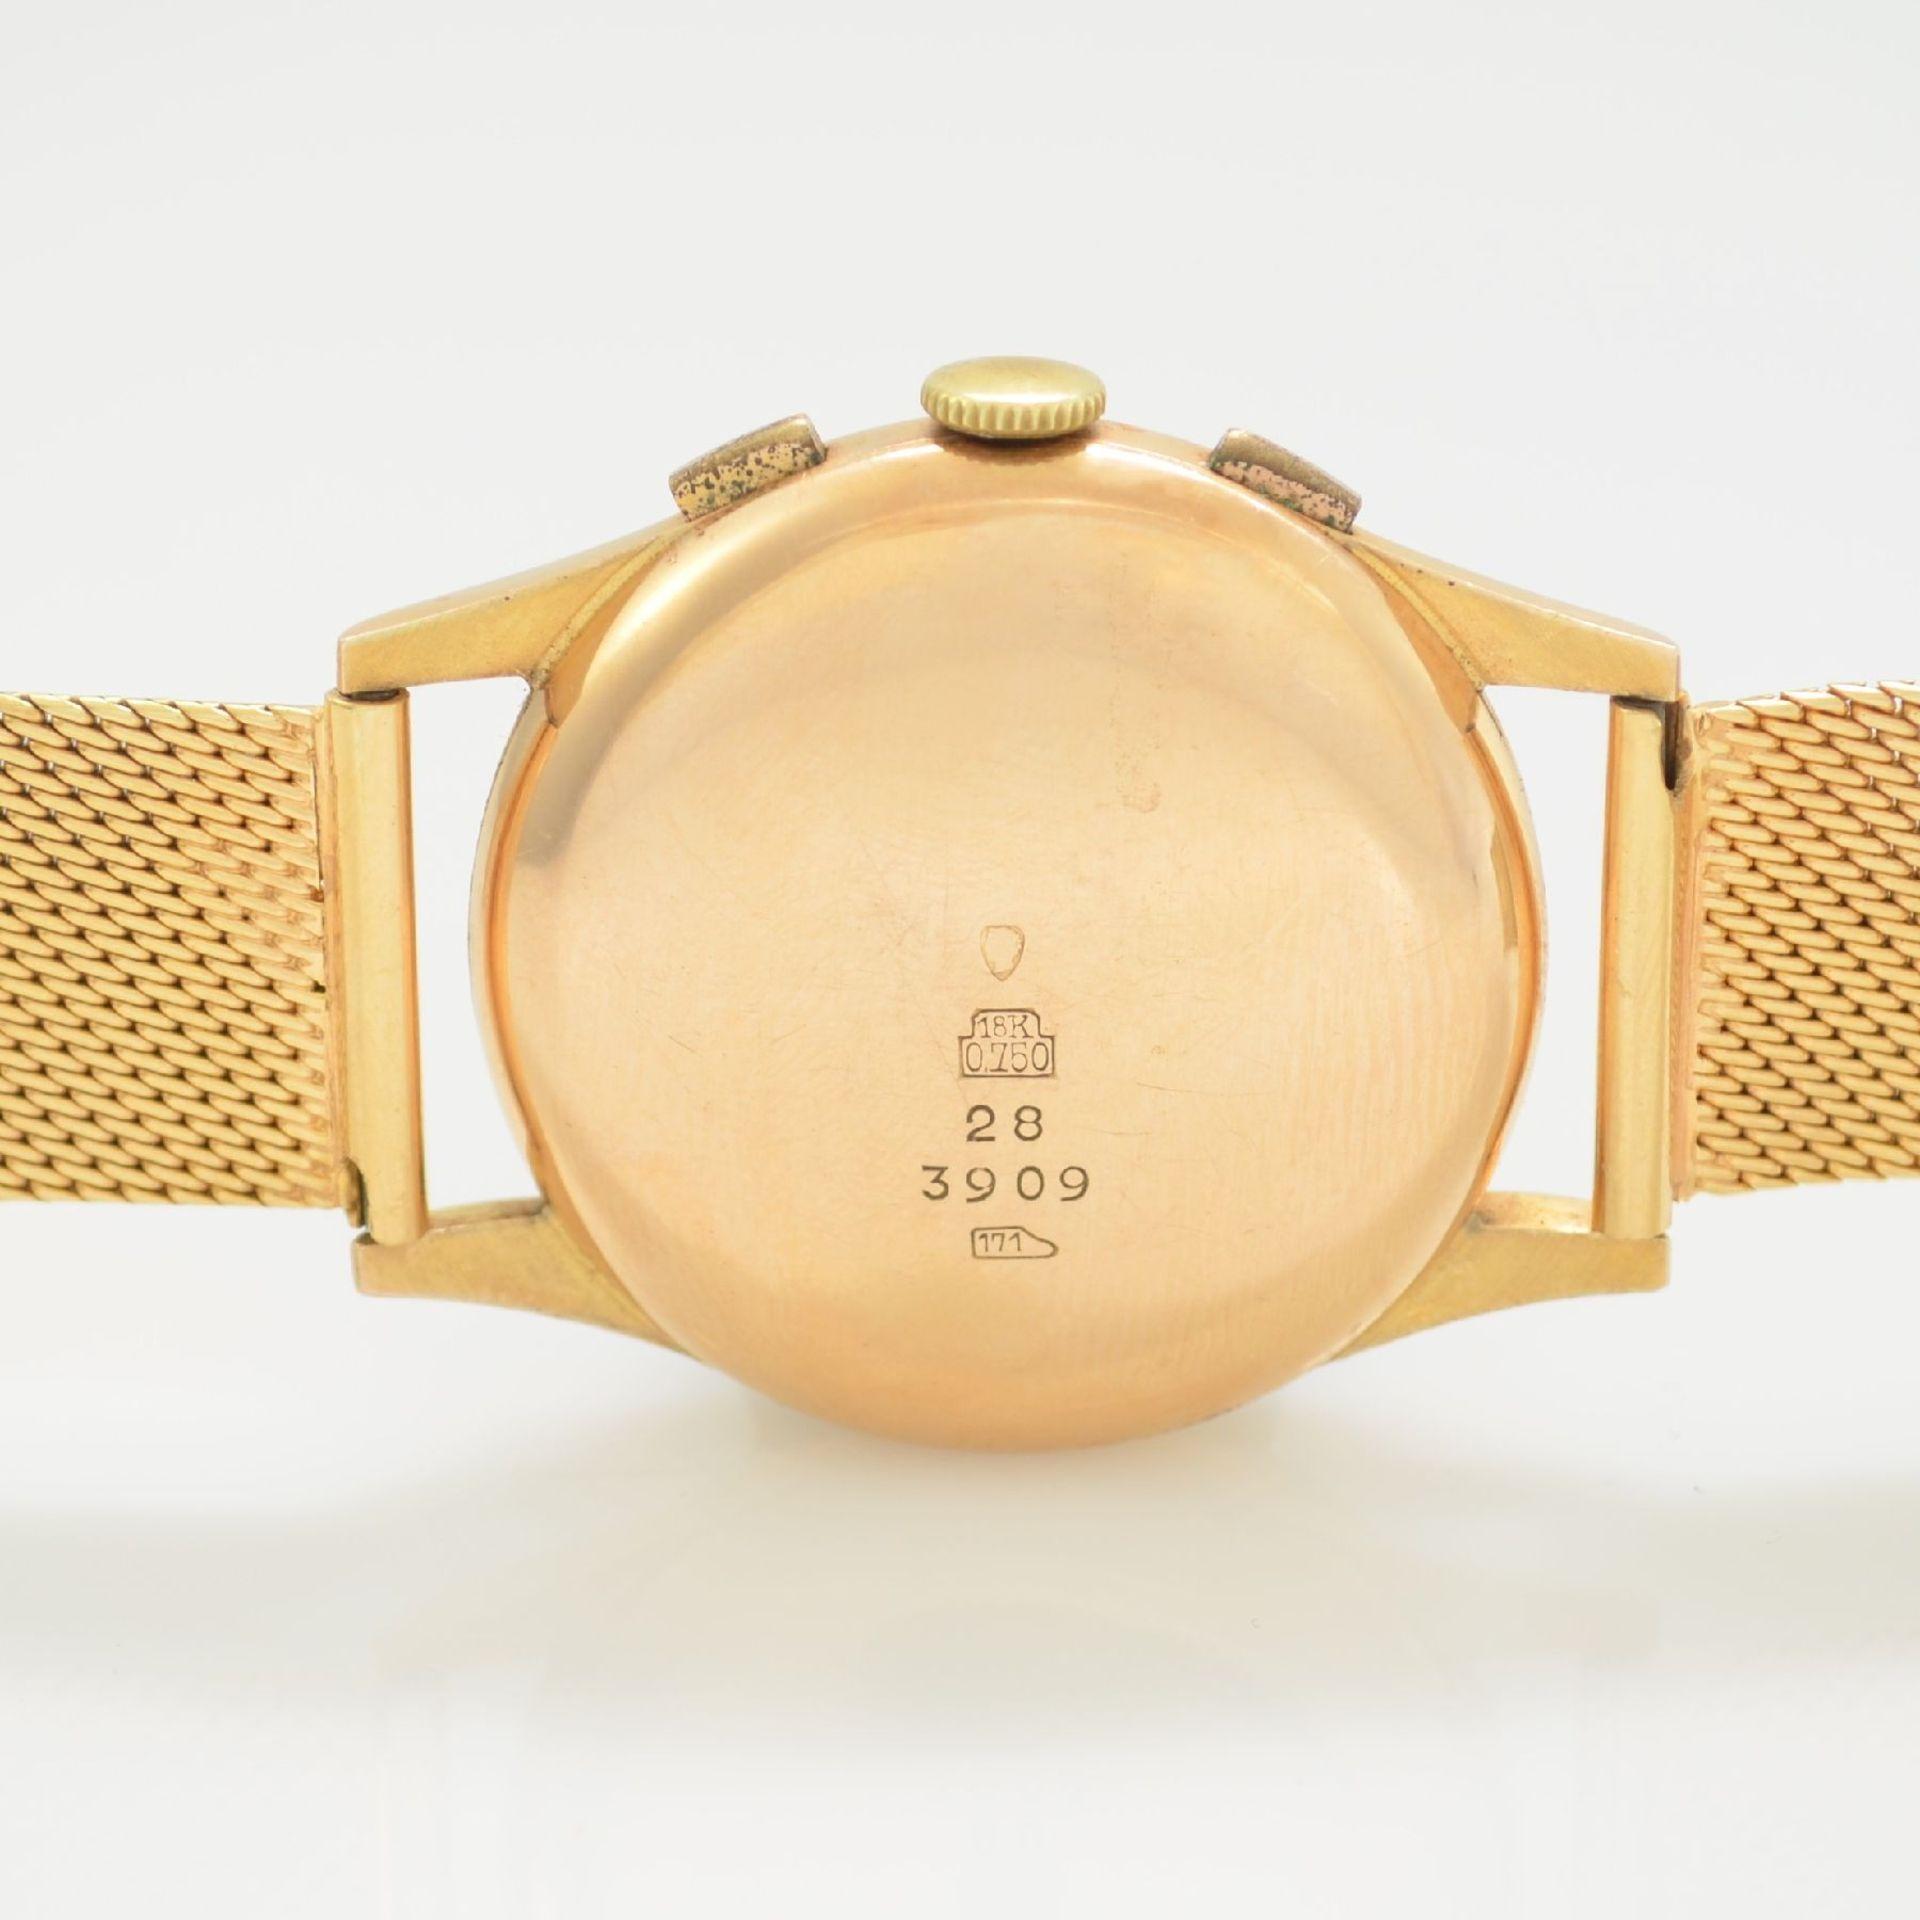 SUPERIO Chronographe Suisse Herrenarmbanduhr mit Chronograph in RoseG 750/000 inkl. RoseG 750/000 - Bild 6 aus 6